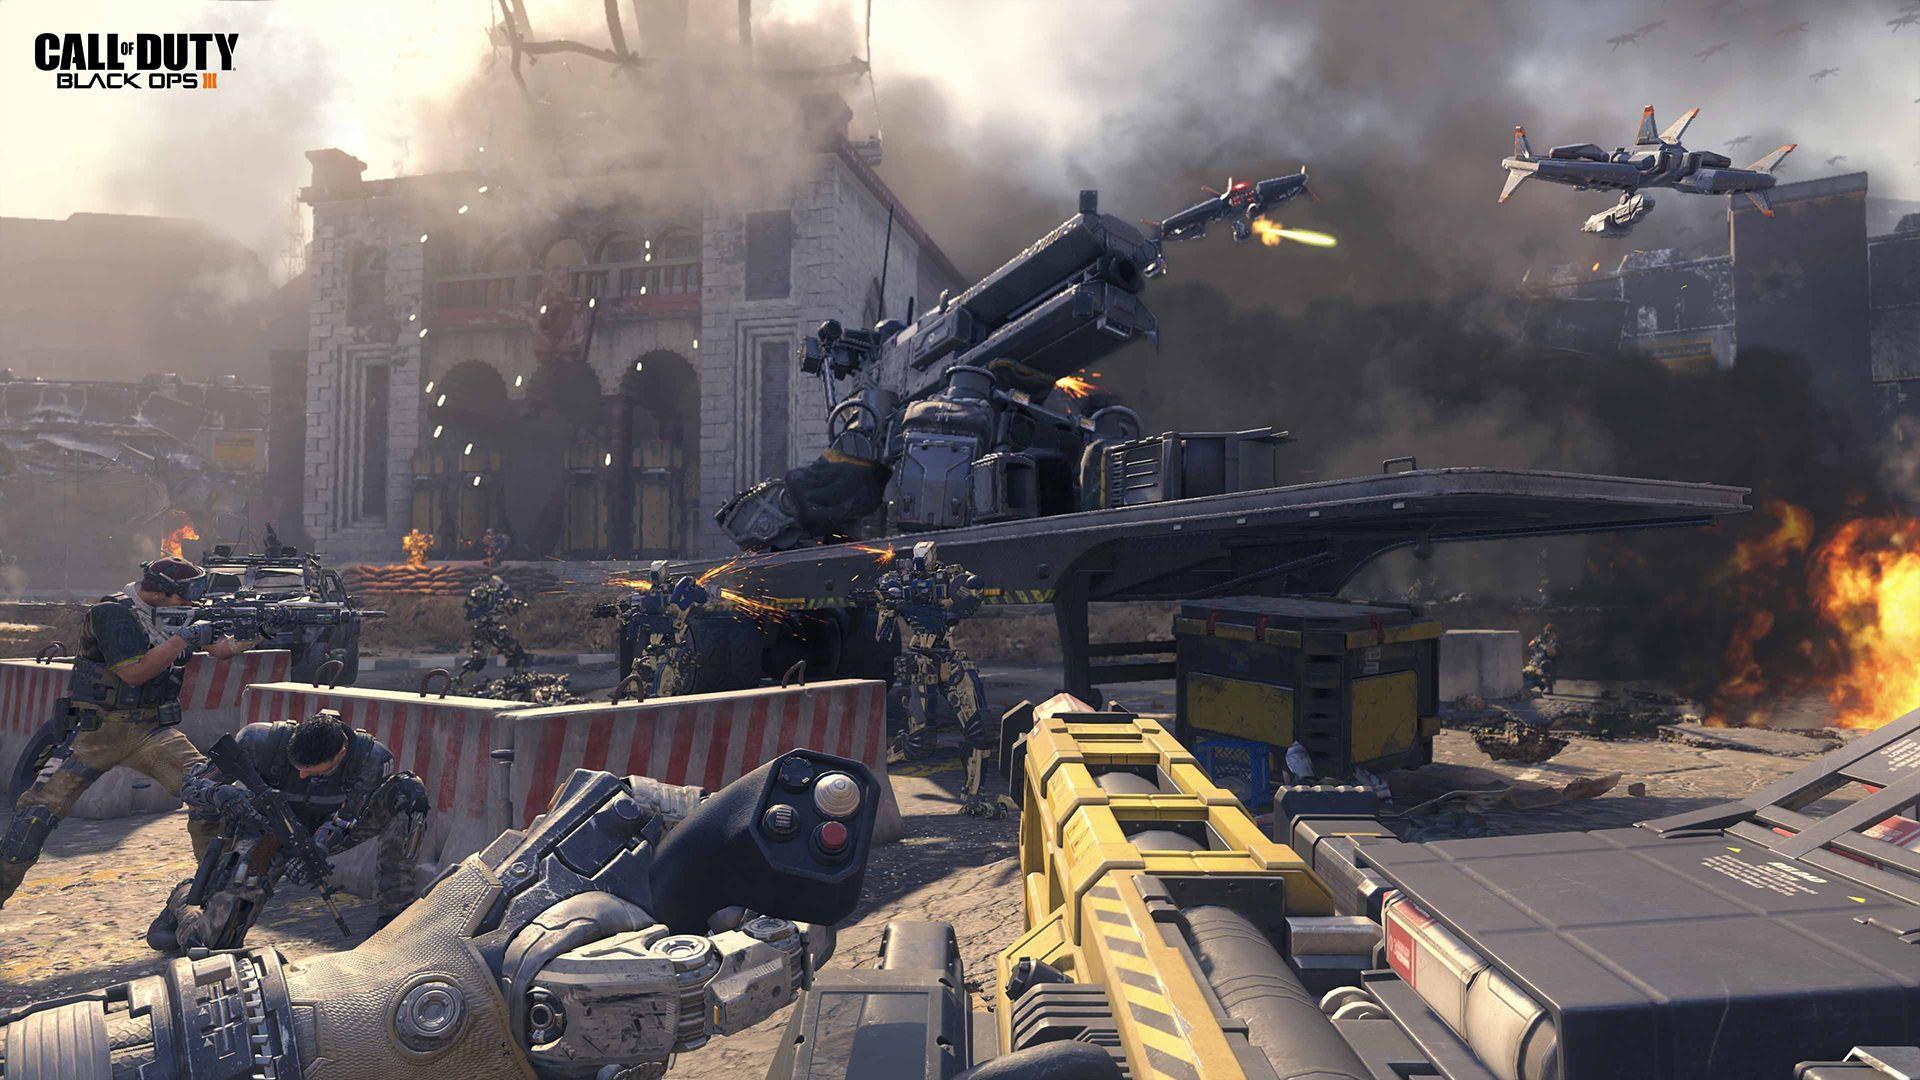 Call of Duty: Black Ops III (PC) - 7